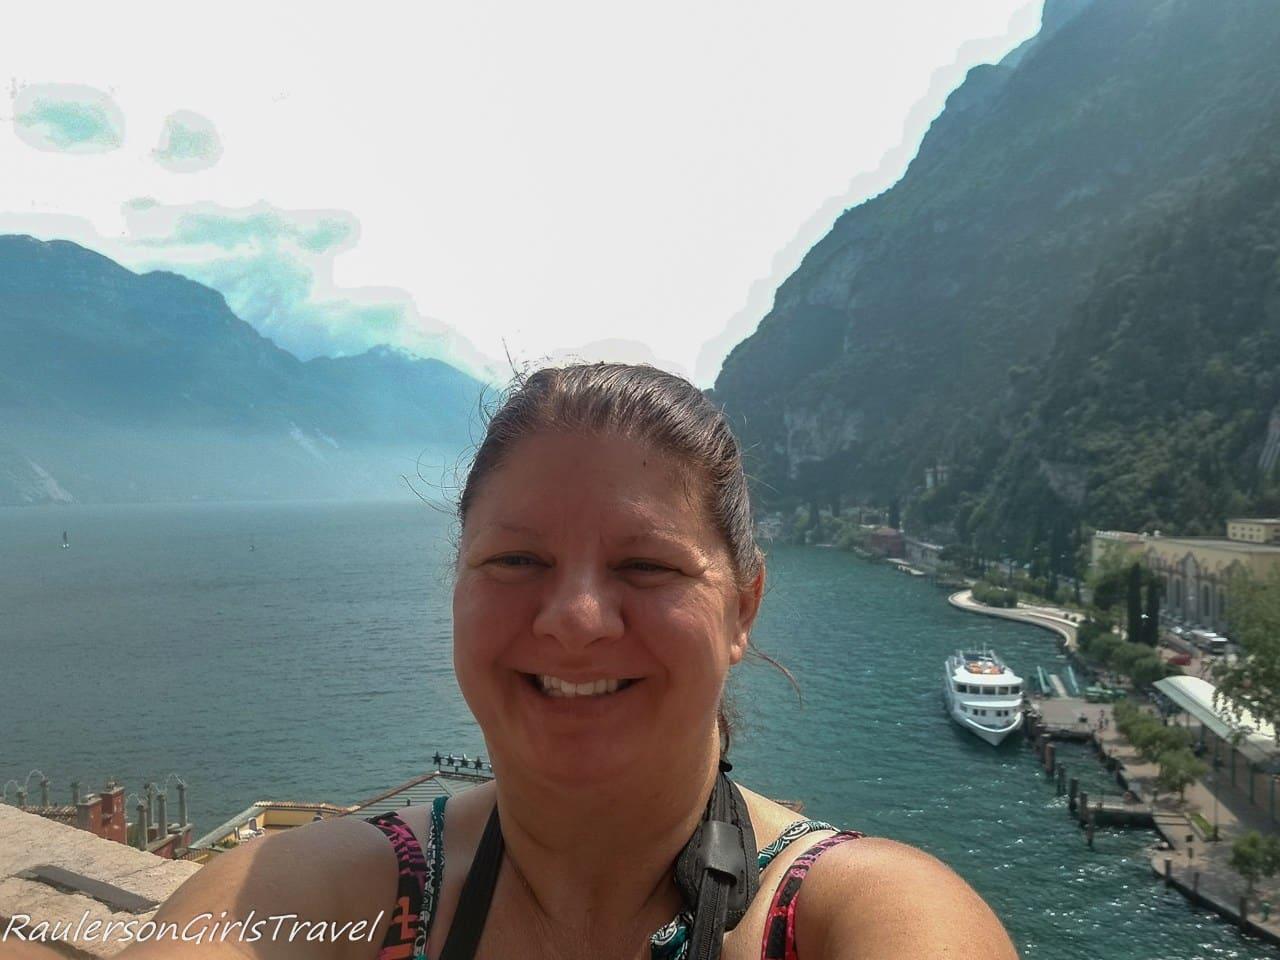 Heather at Riva del Garda